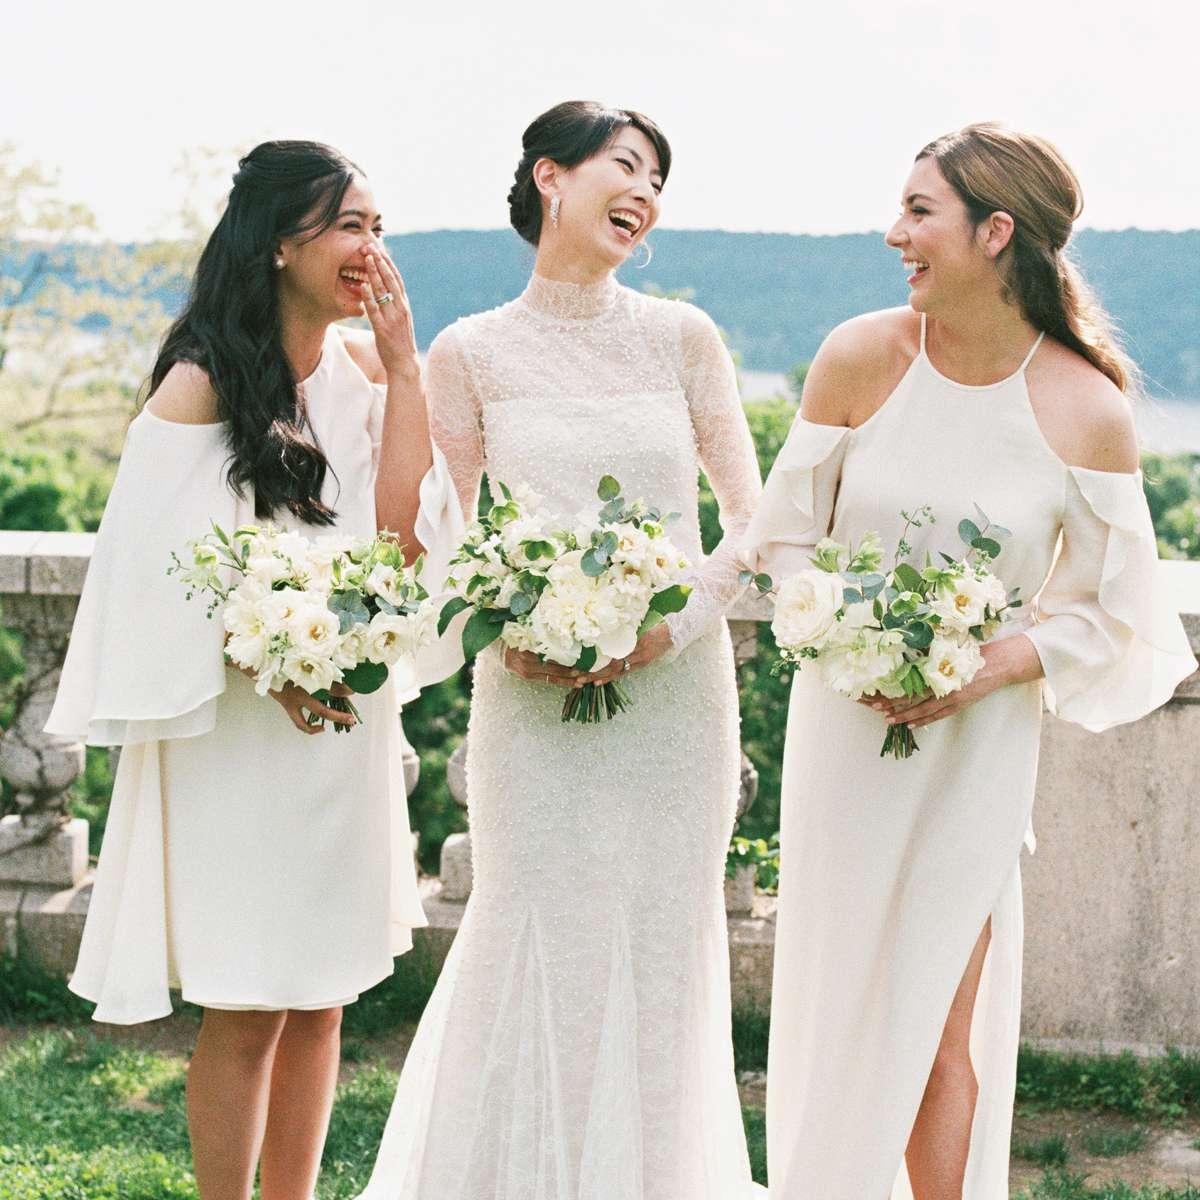 Bridesmaids with half-up 'dos and bride